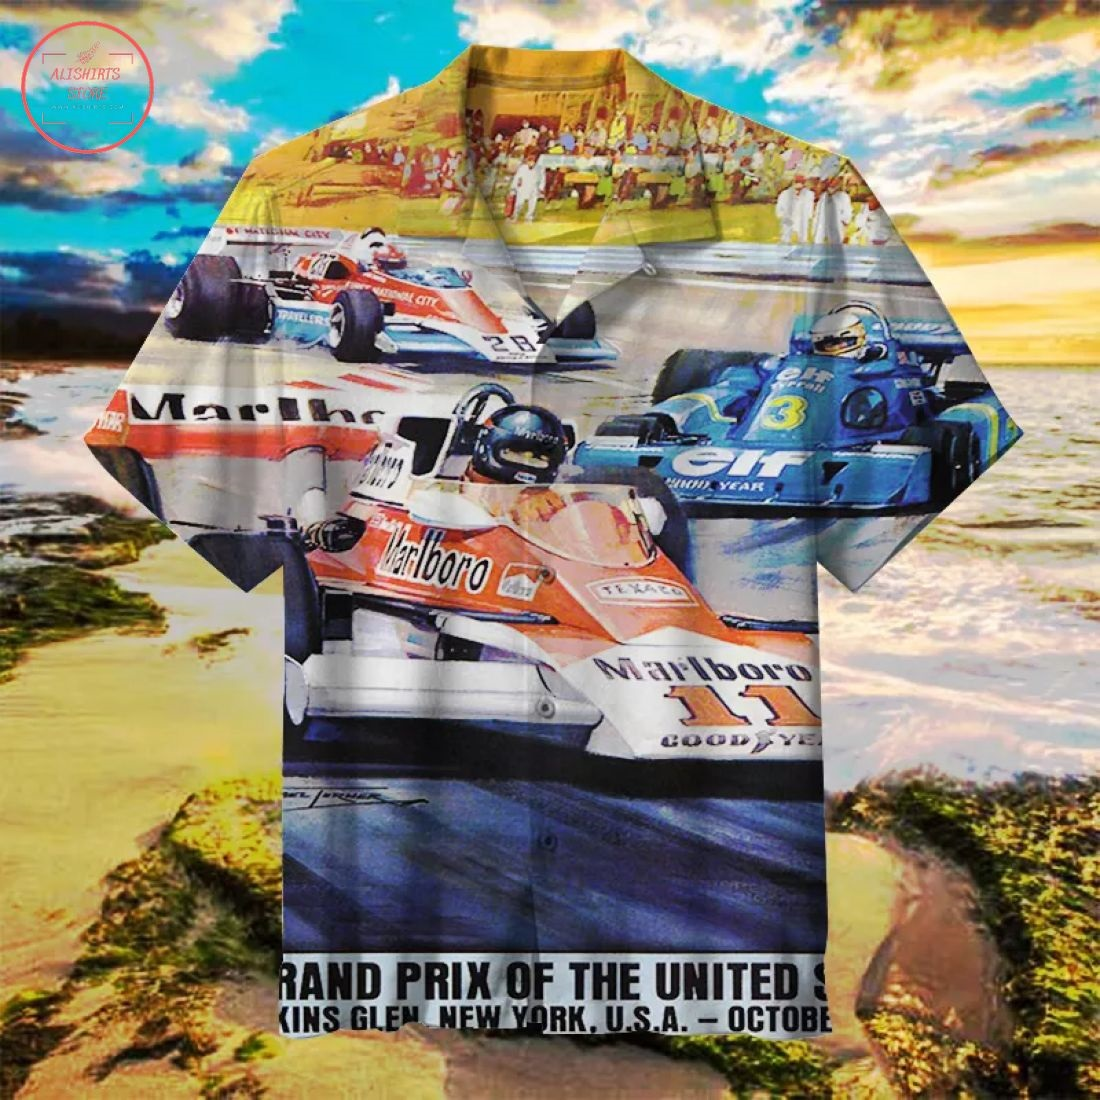 Grand Prix of the United States Hawaiian Shirt